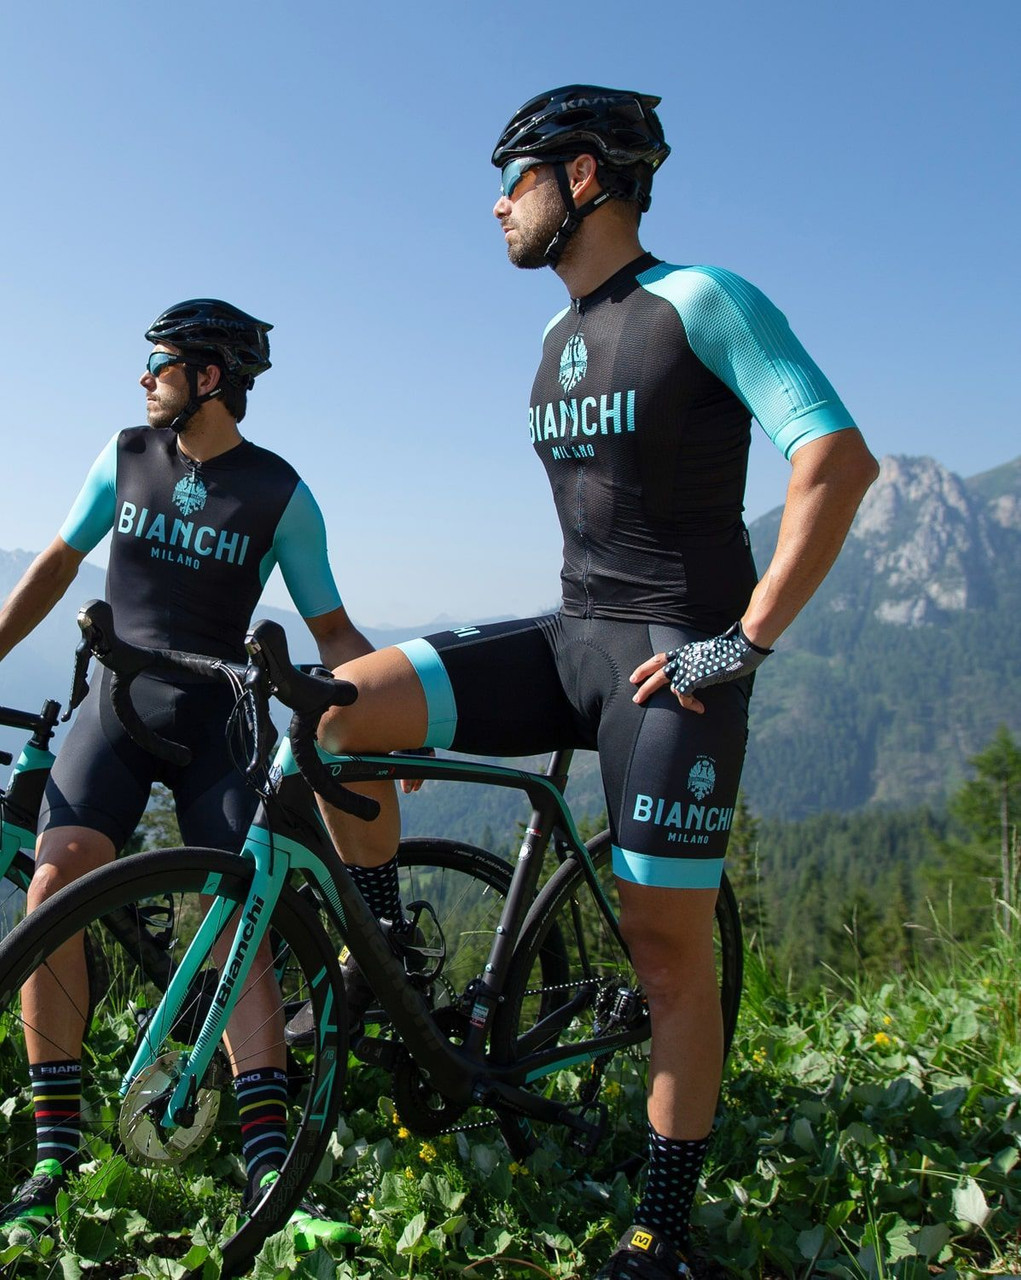 Bianchi Milano Valconca1 Aero Black Green Jersey Riders